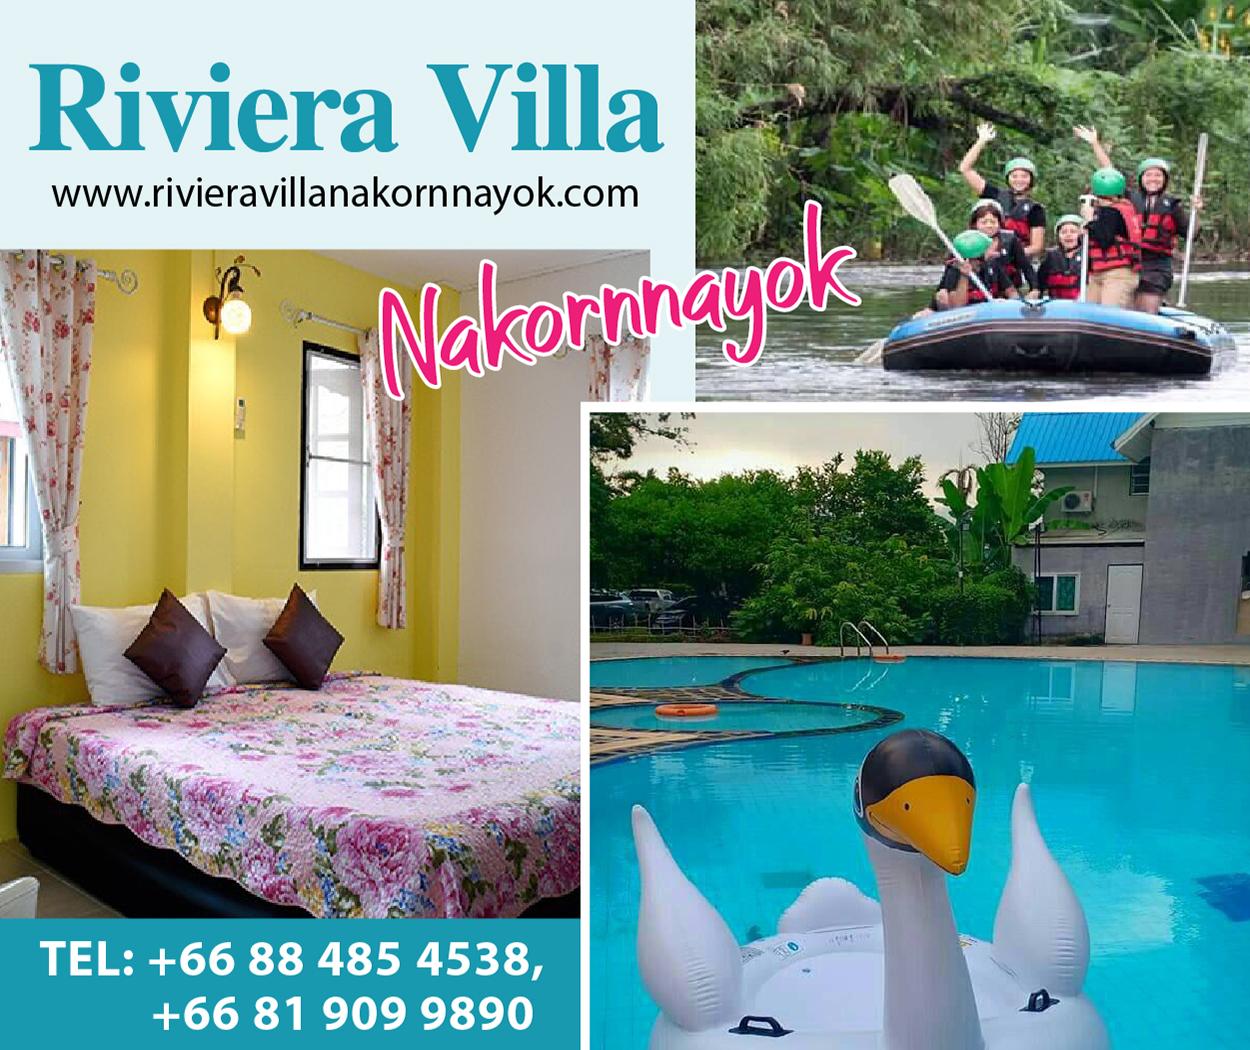 Riviera Villa Resort Nakornnayok